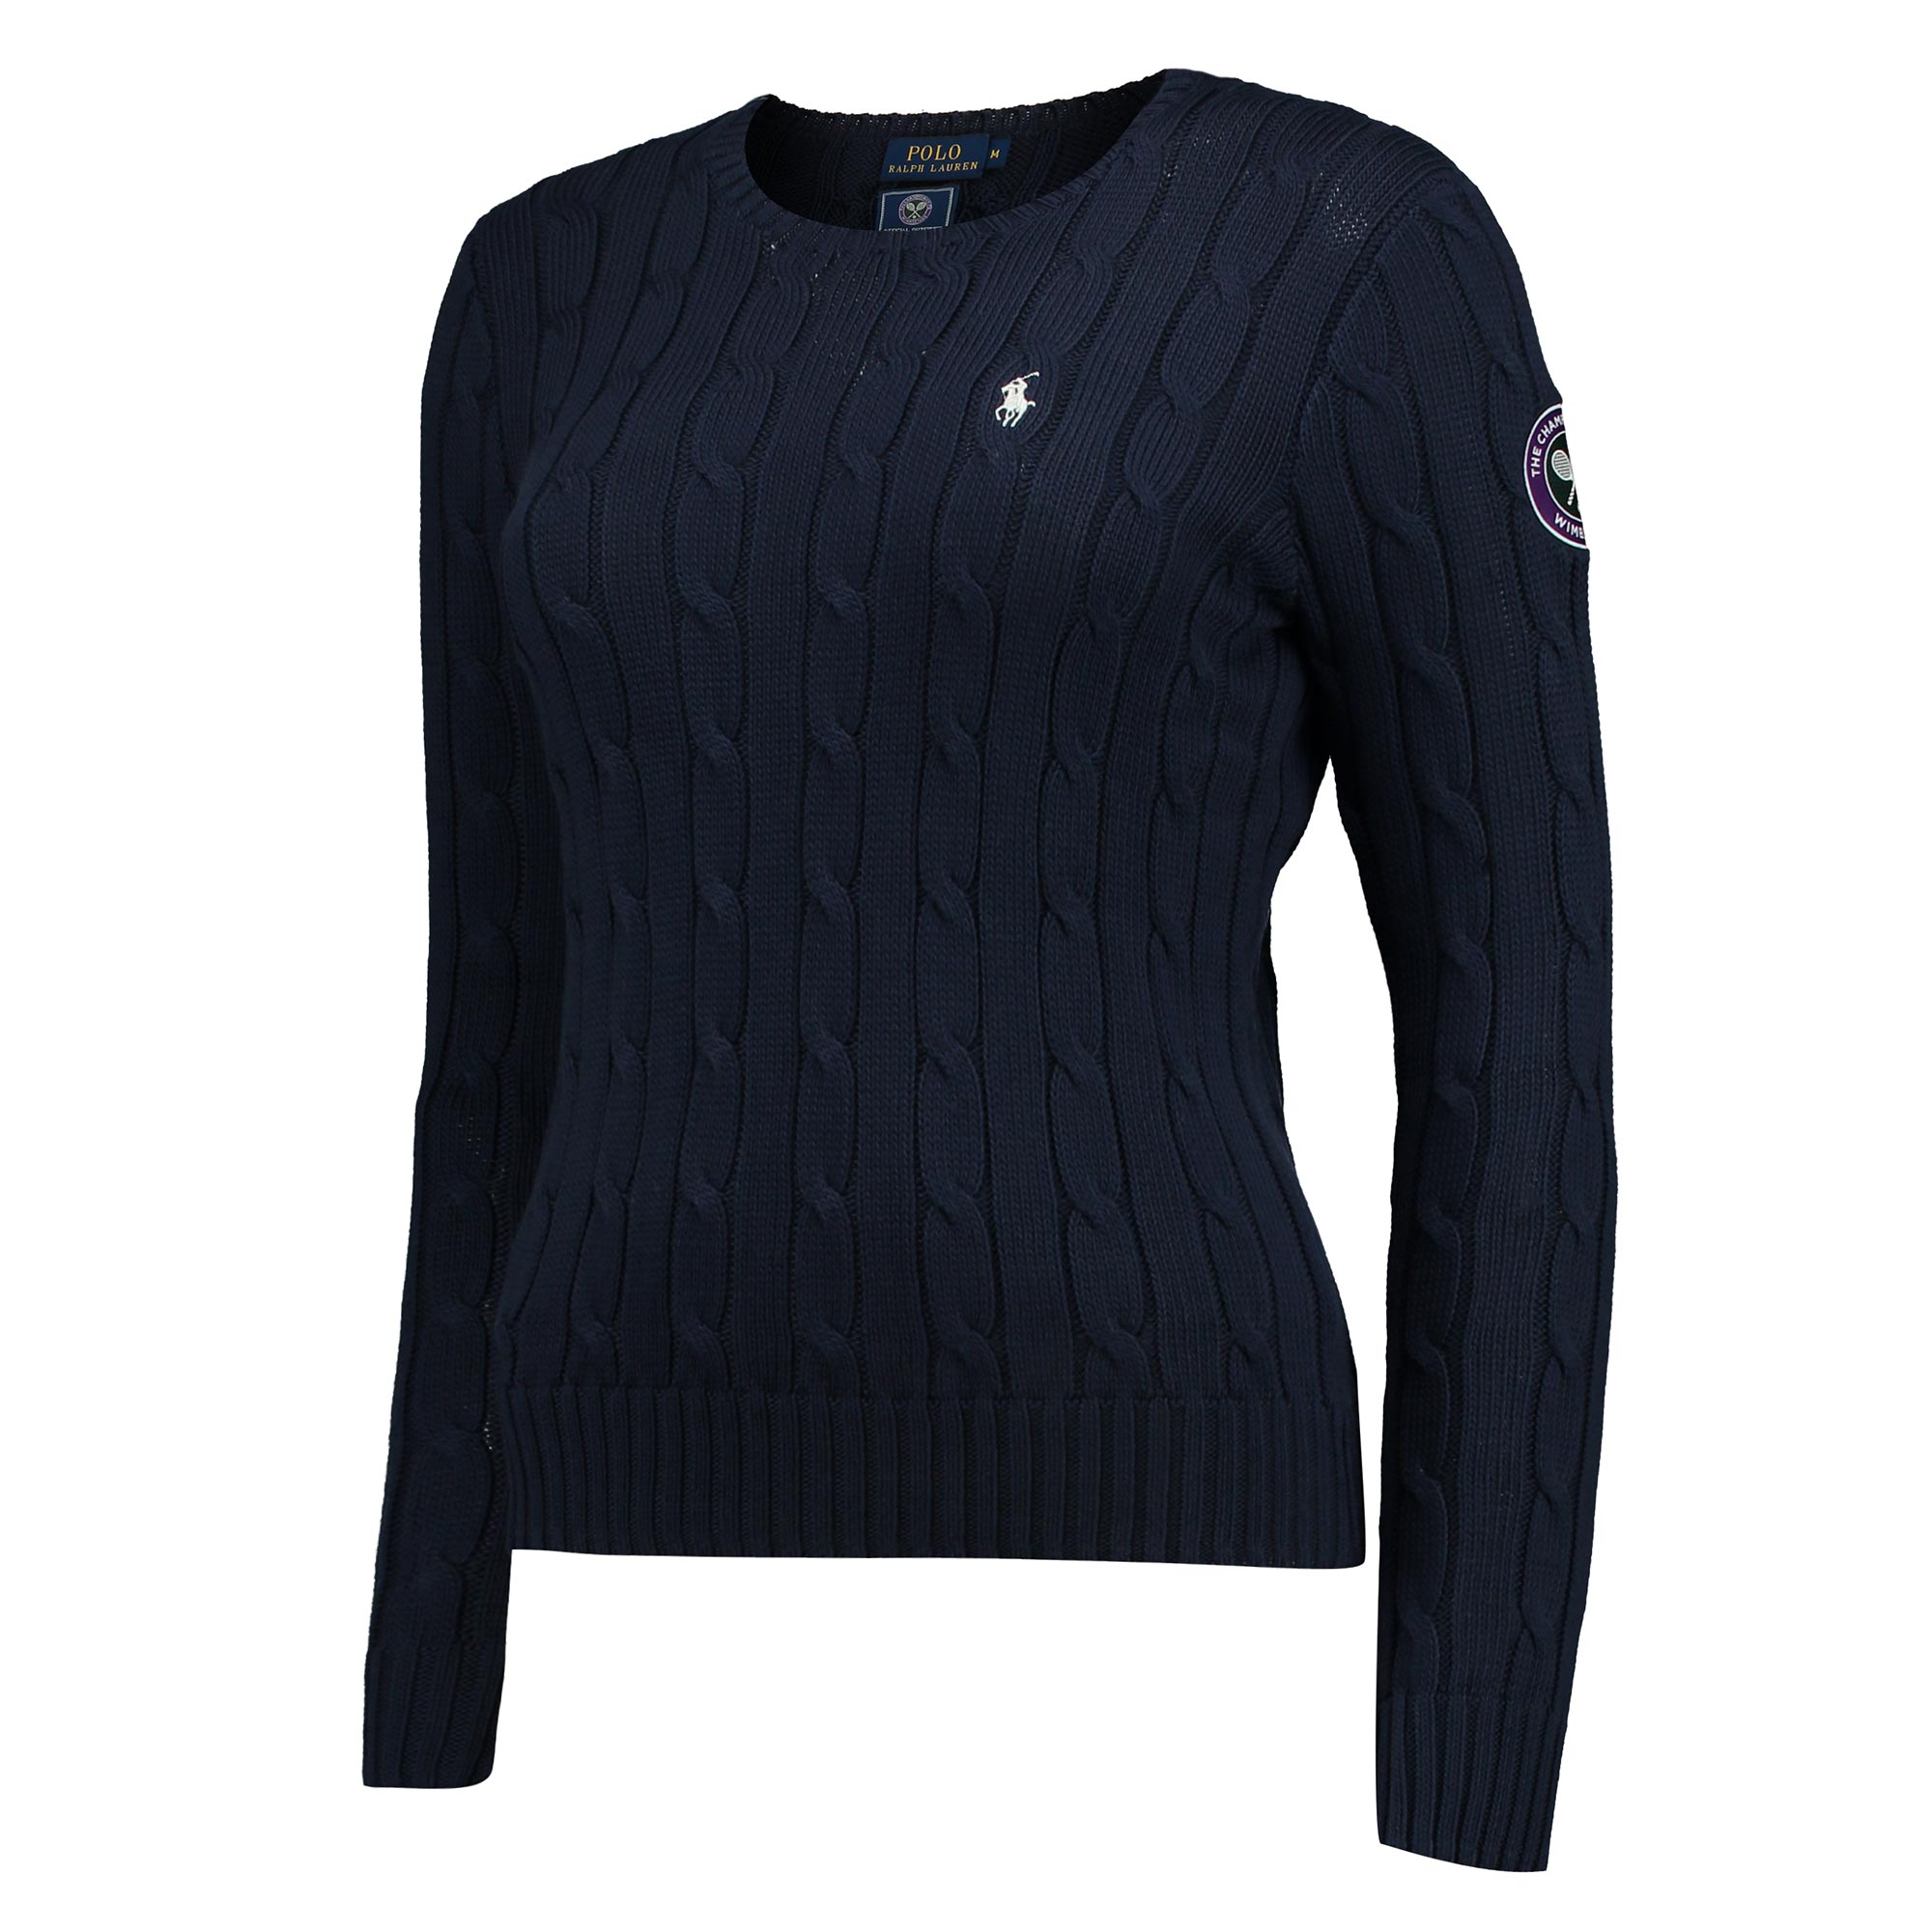 Wimbledon Ralph Lauren Sweater - French Navy - Ladies